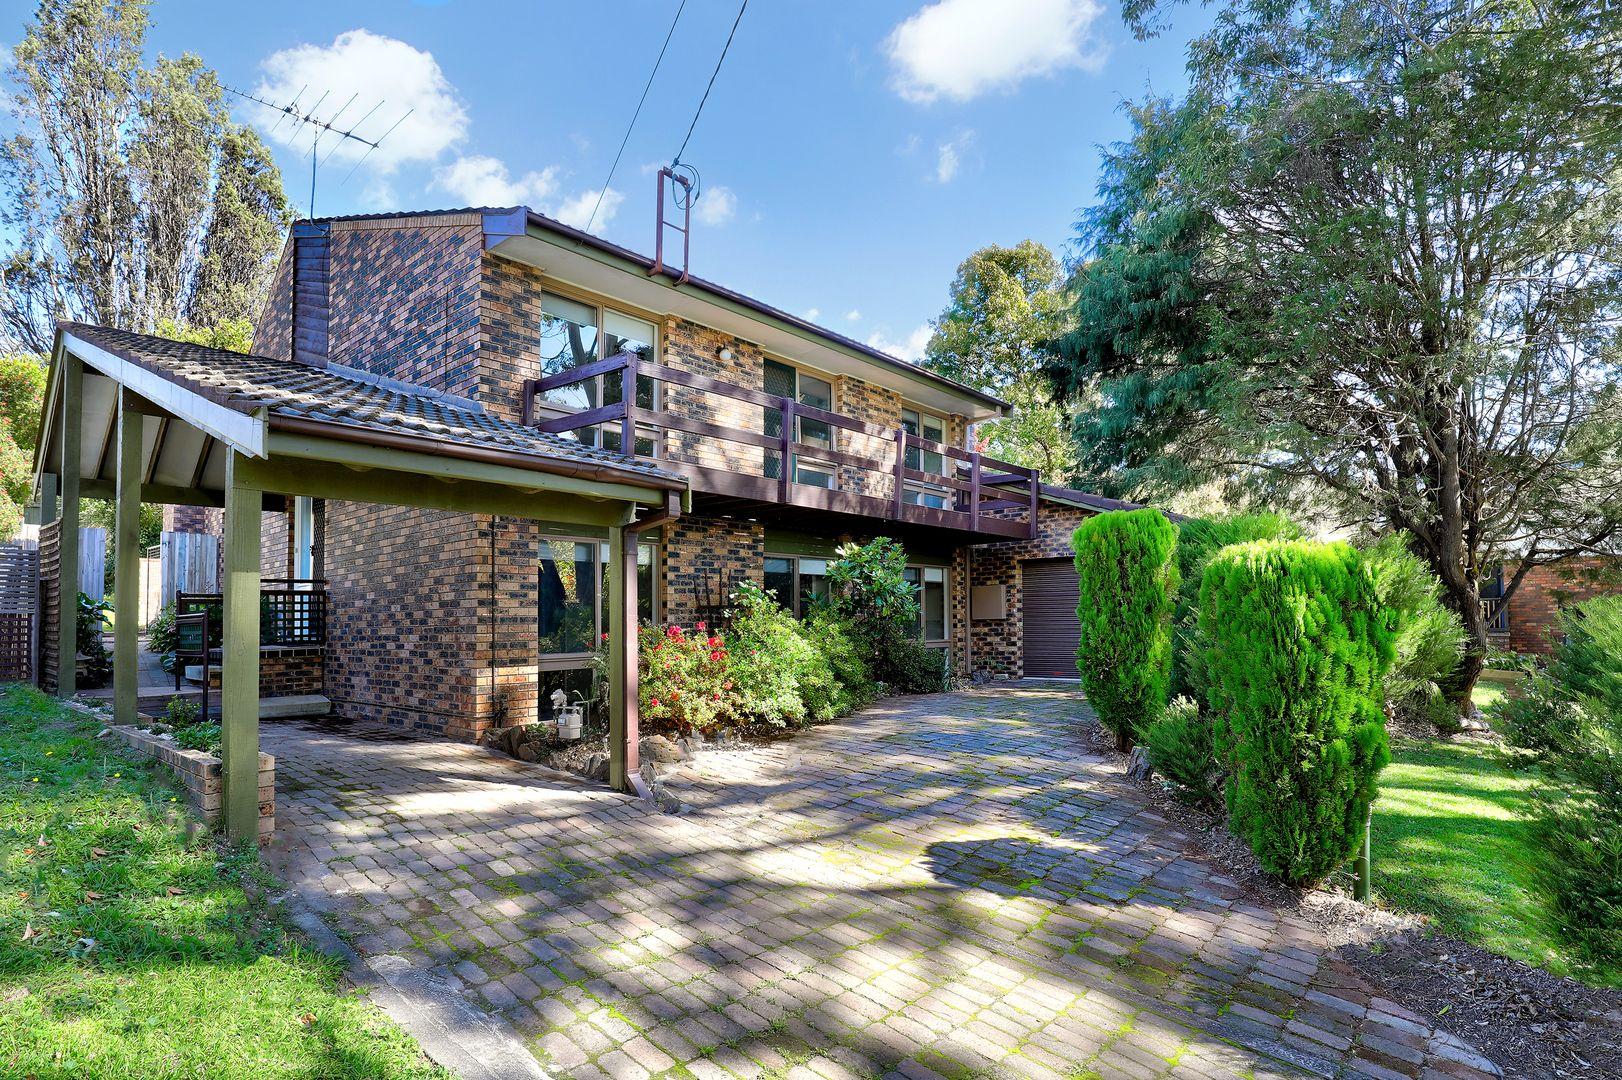 10-12 Monmouth Street, Mount Victoria NSW 2786, Image 0